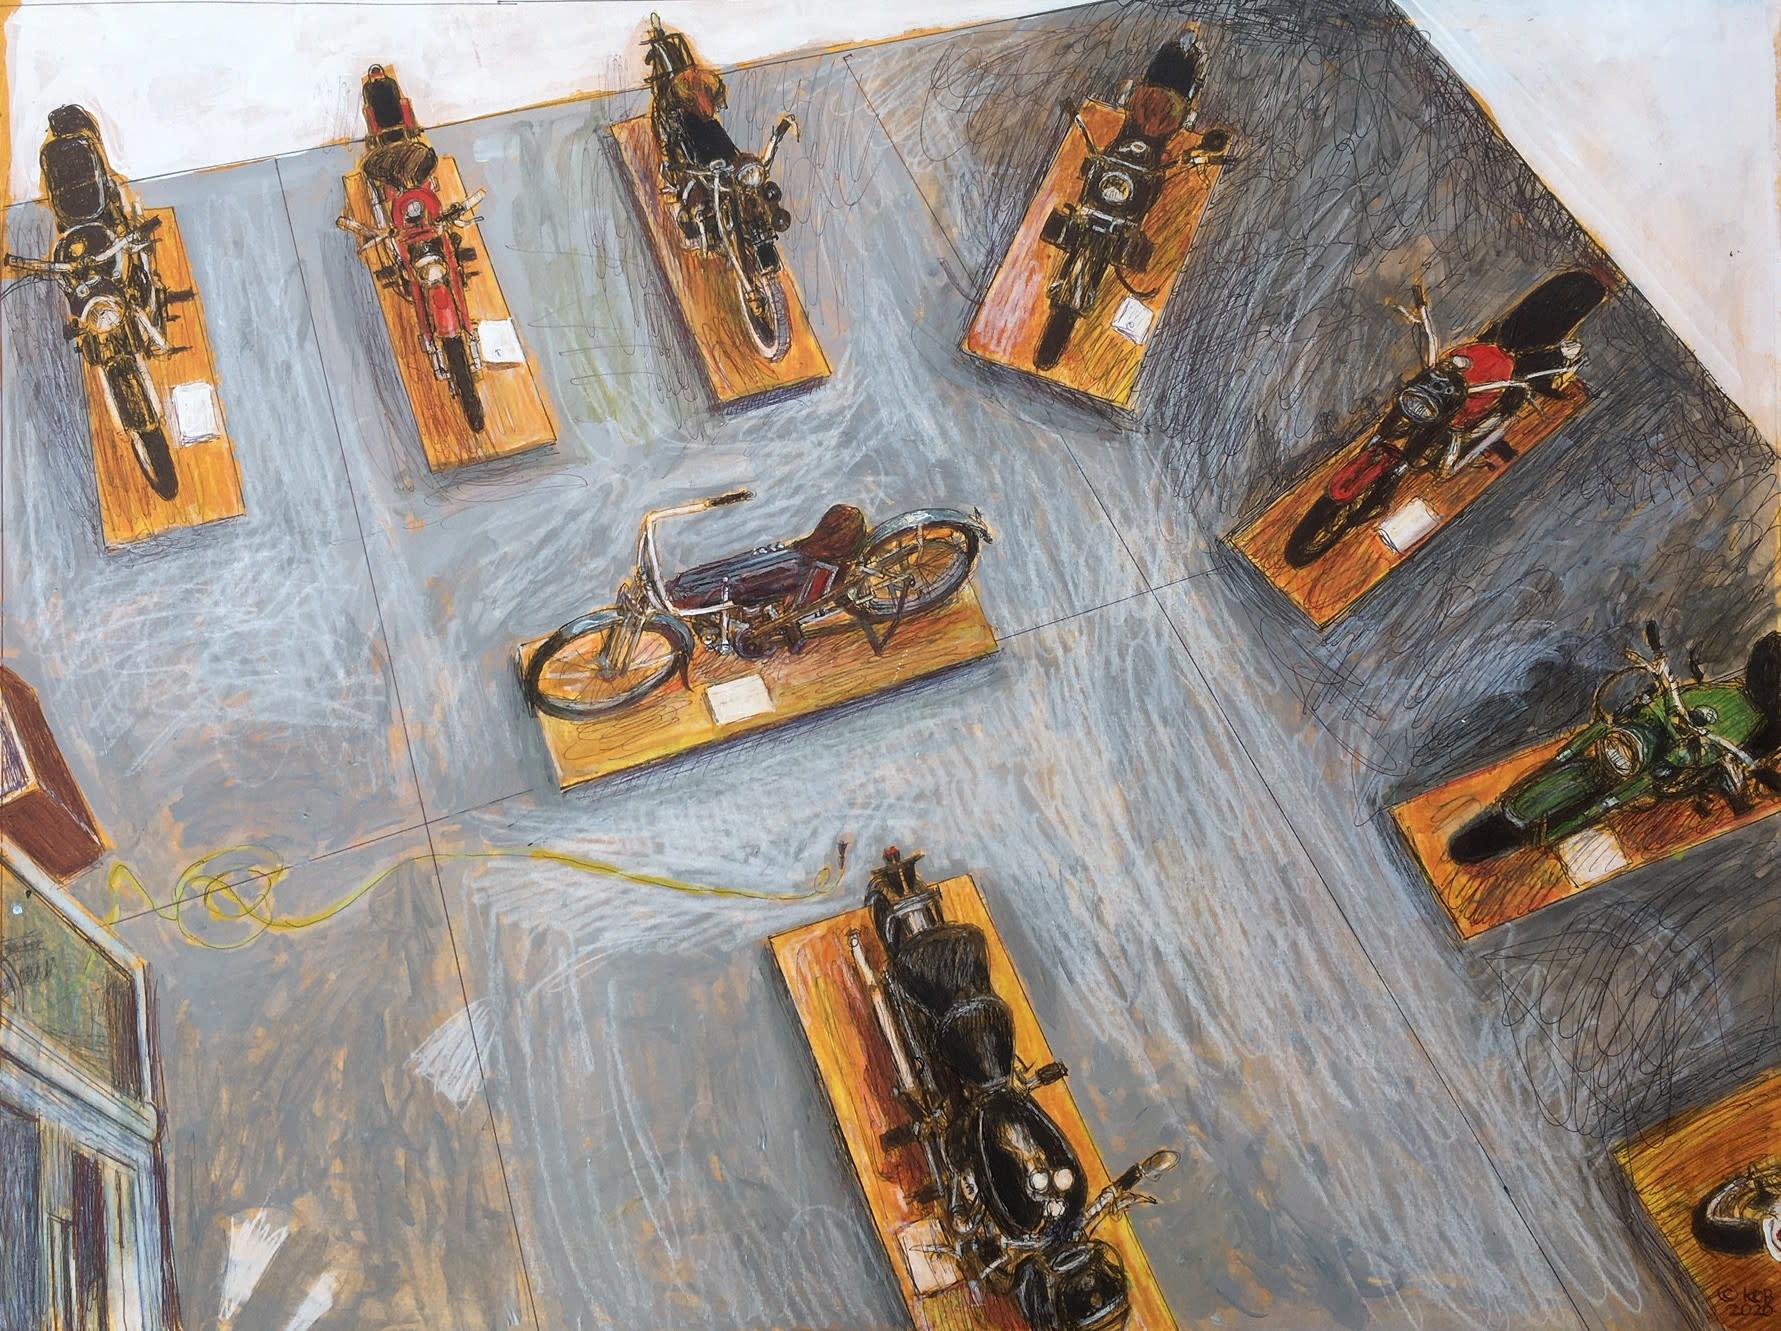 Kobrienbirds eye motorcycle exhibit23.5x18acrylicprismacolorinkonpaper 1600 bvbbq7